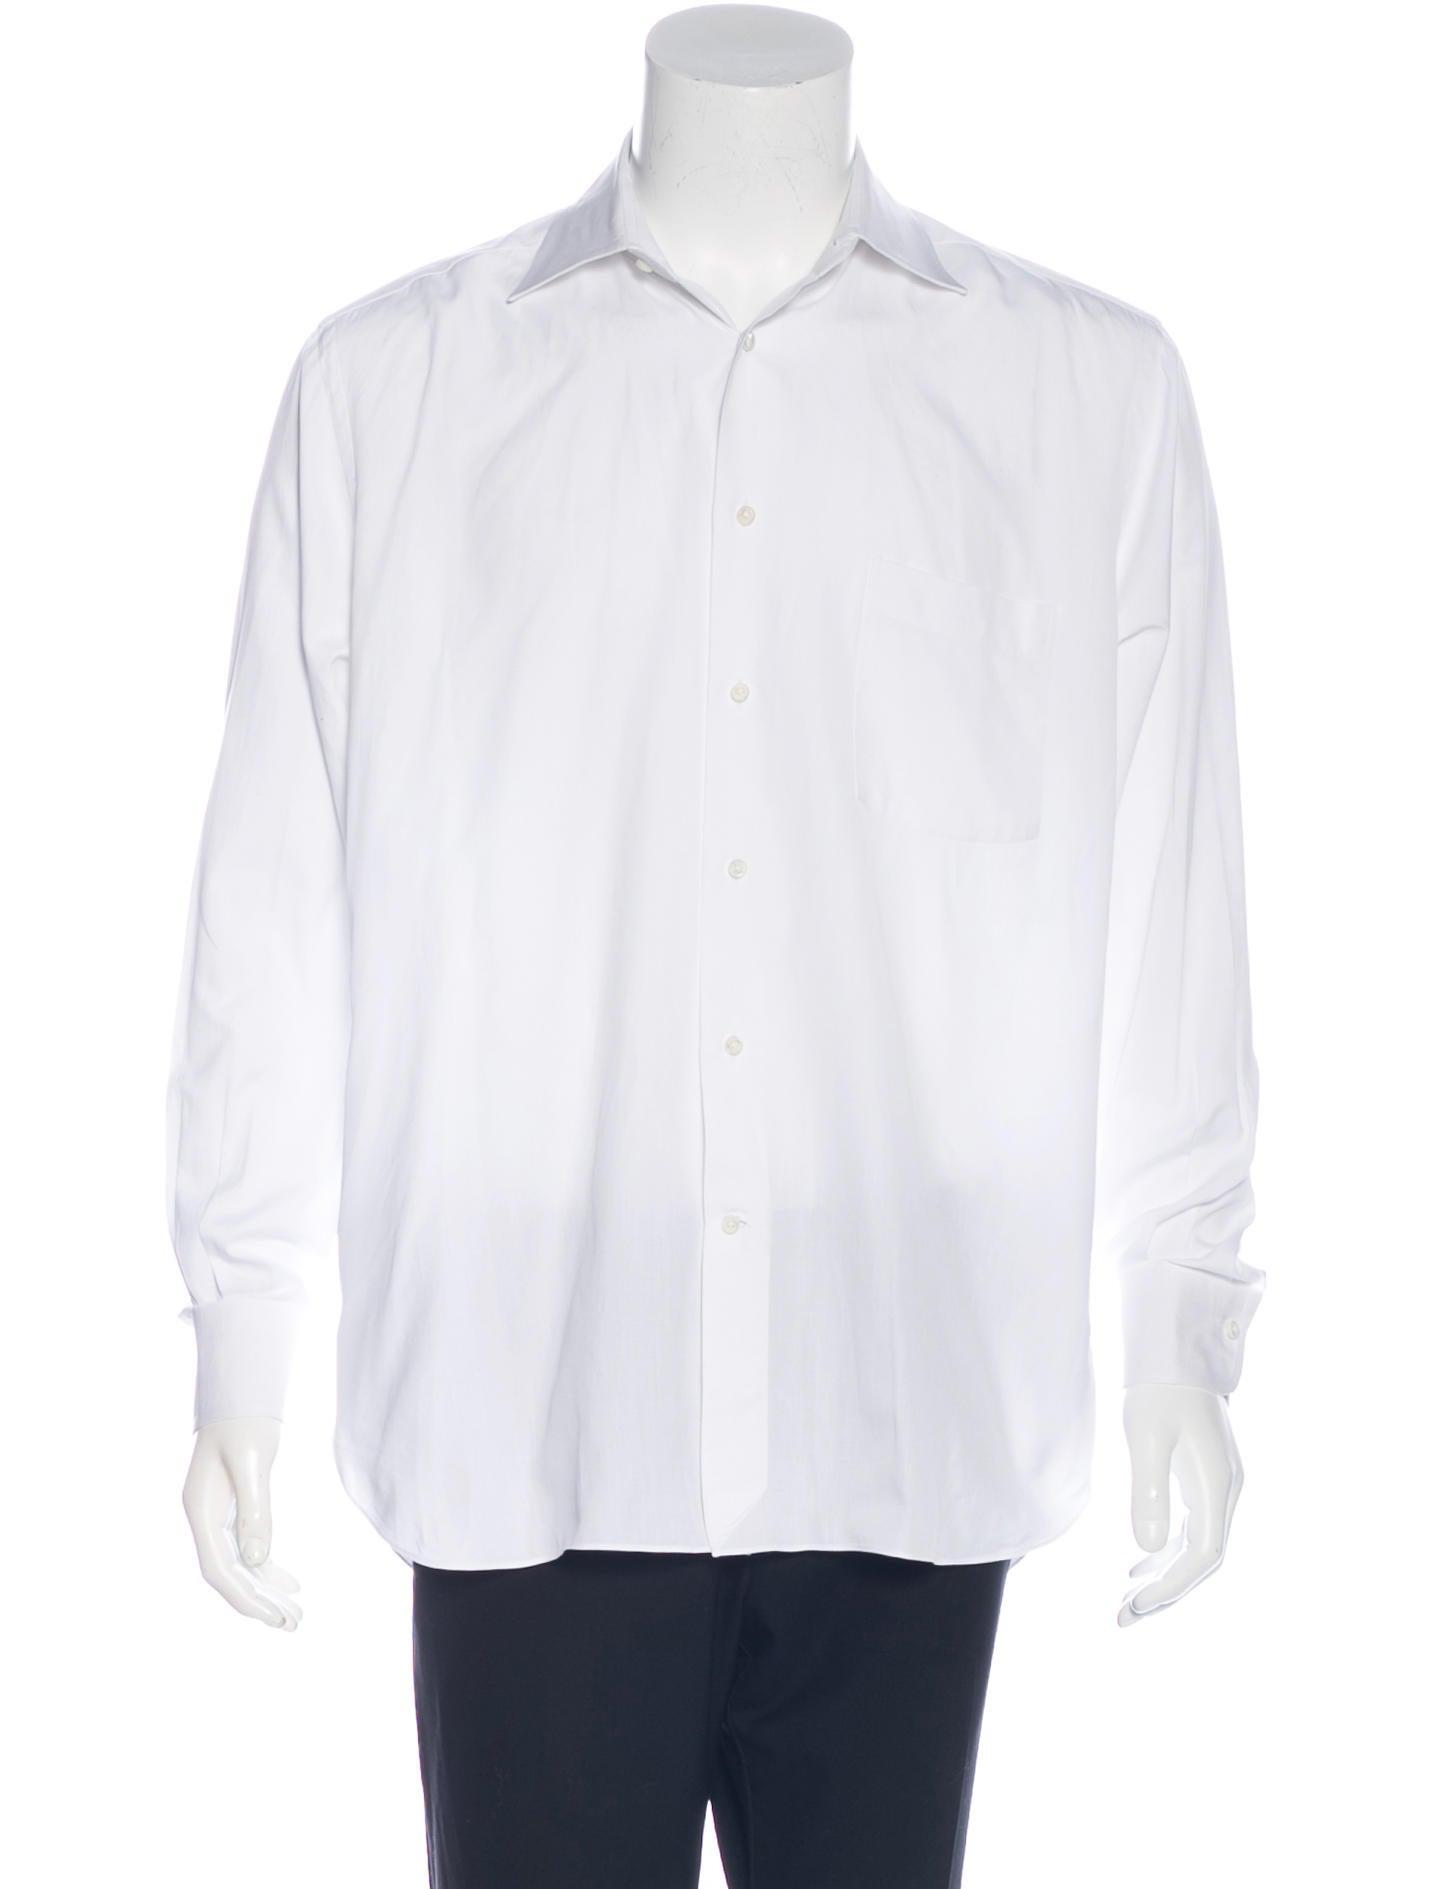 ermenegildo zegna woven dress shirt clothing zgn24853 the realreal. Black Bedroom Furniture Sets. Home Design Ideas